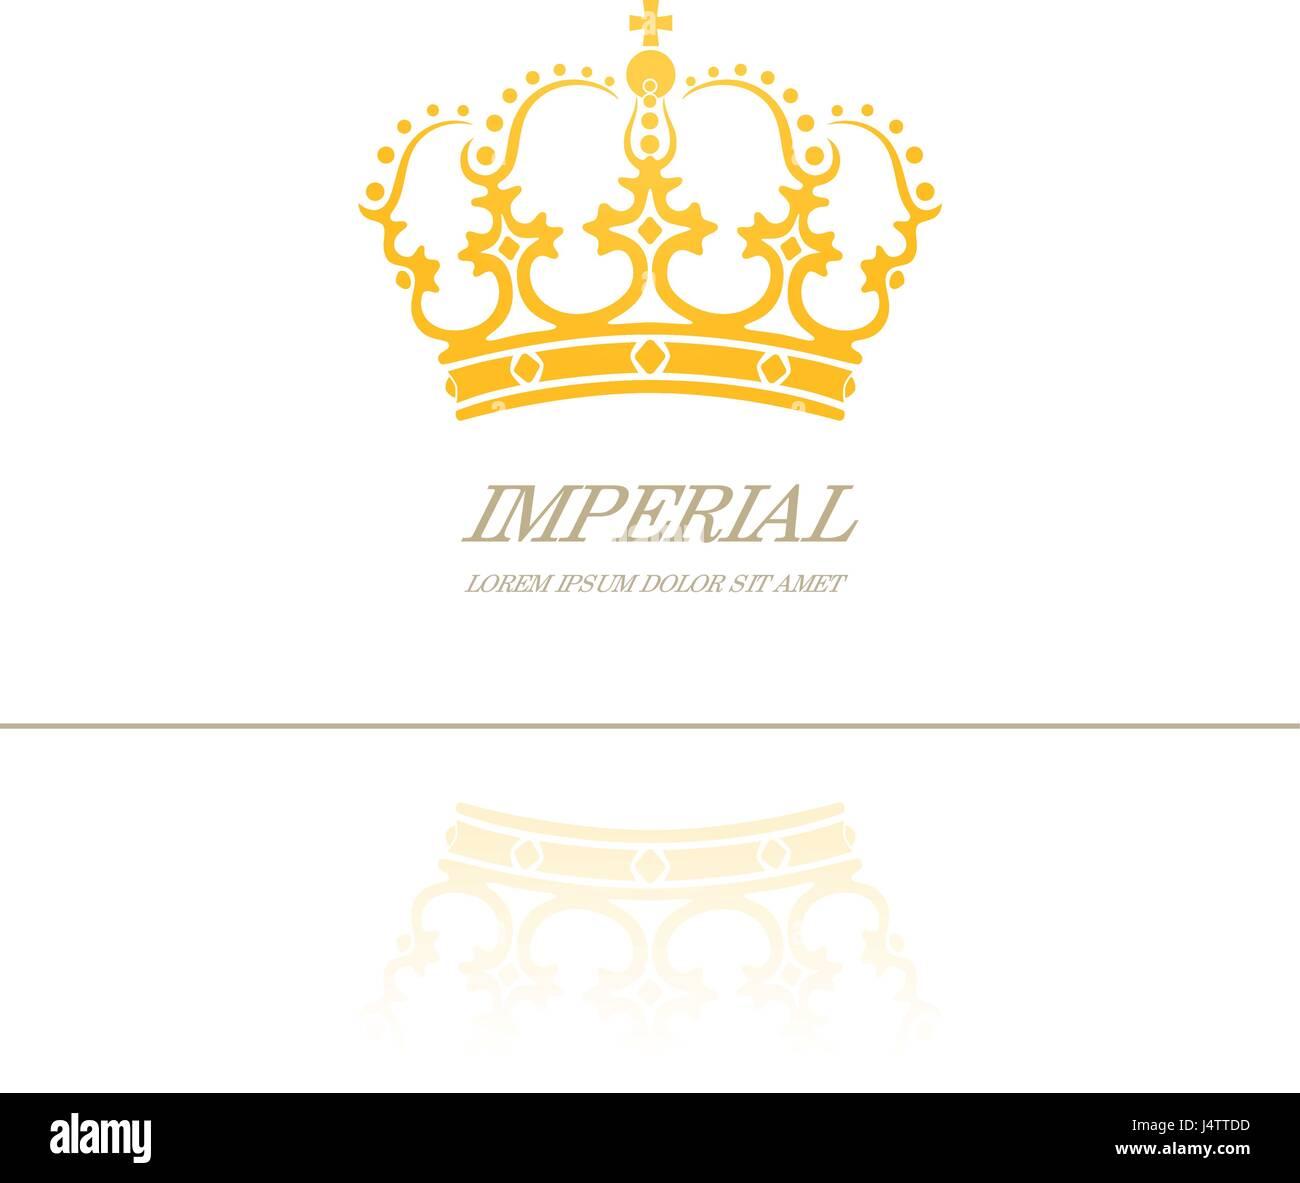 Royal Arms of England  Wikipedia